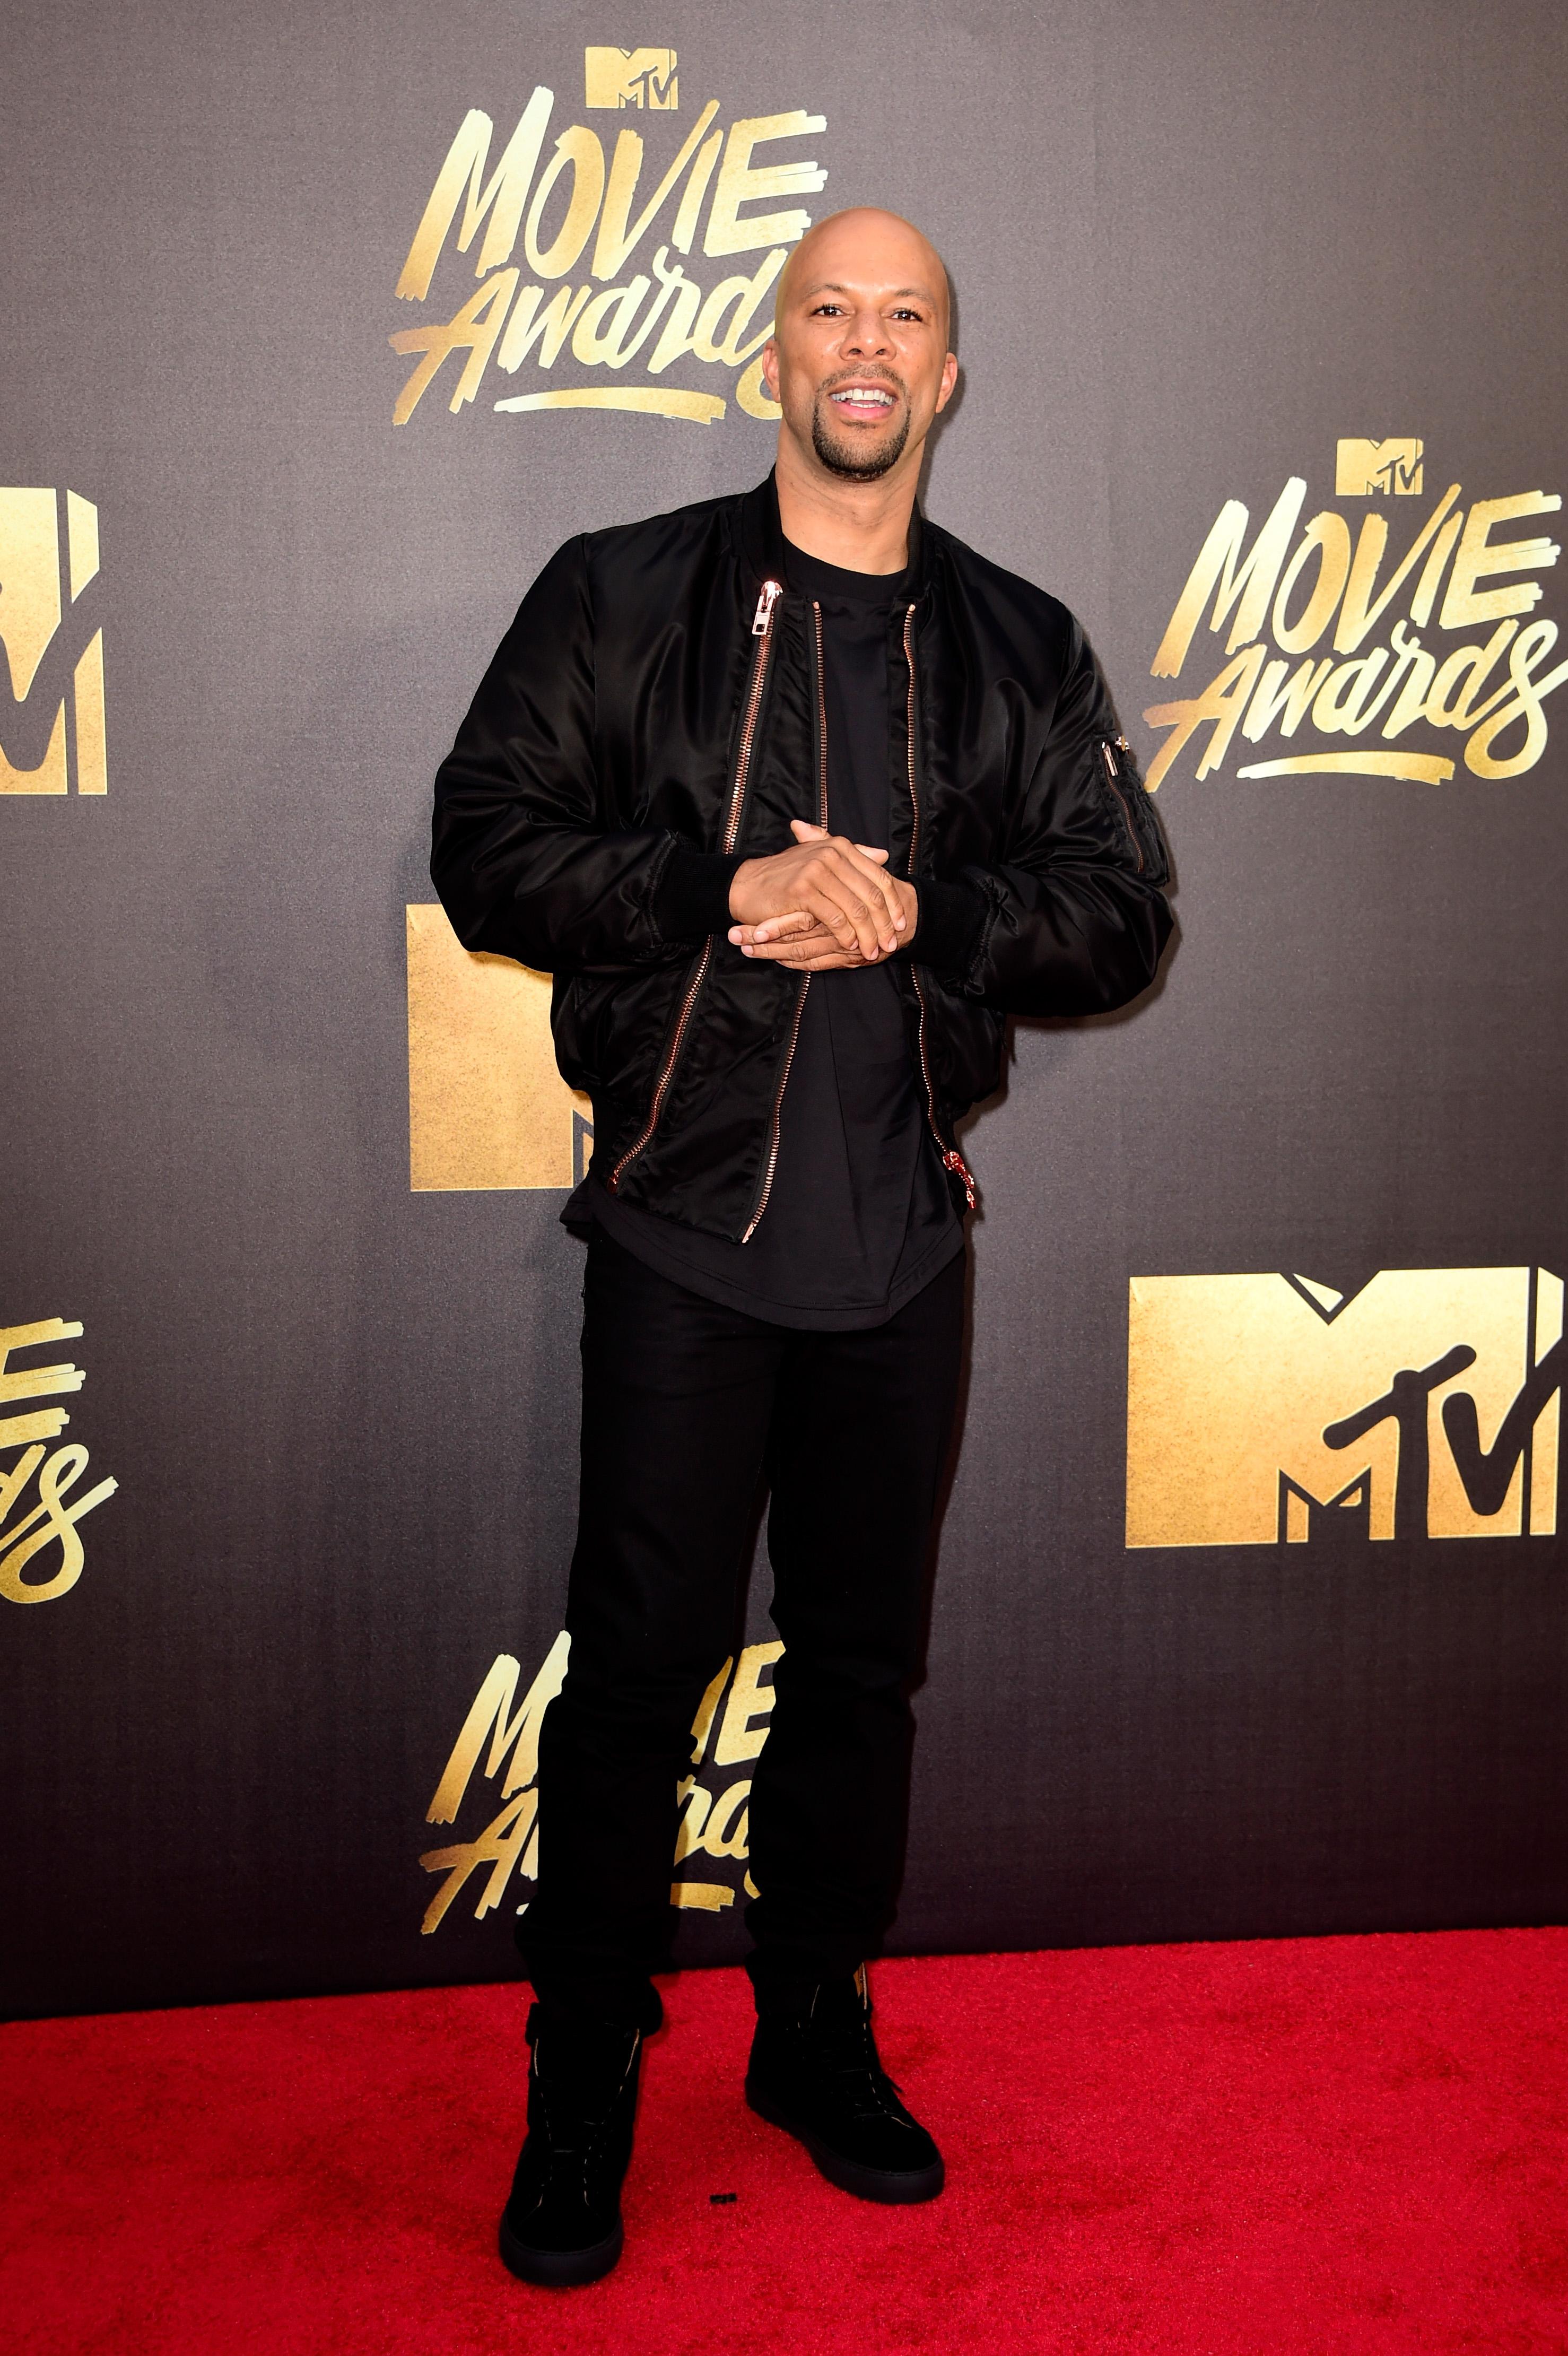 Common attends the 2016 MTV Movie Awards at Warner Bros. Studios on April 9, 2016 in Burbank, Calif.